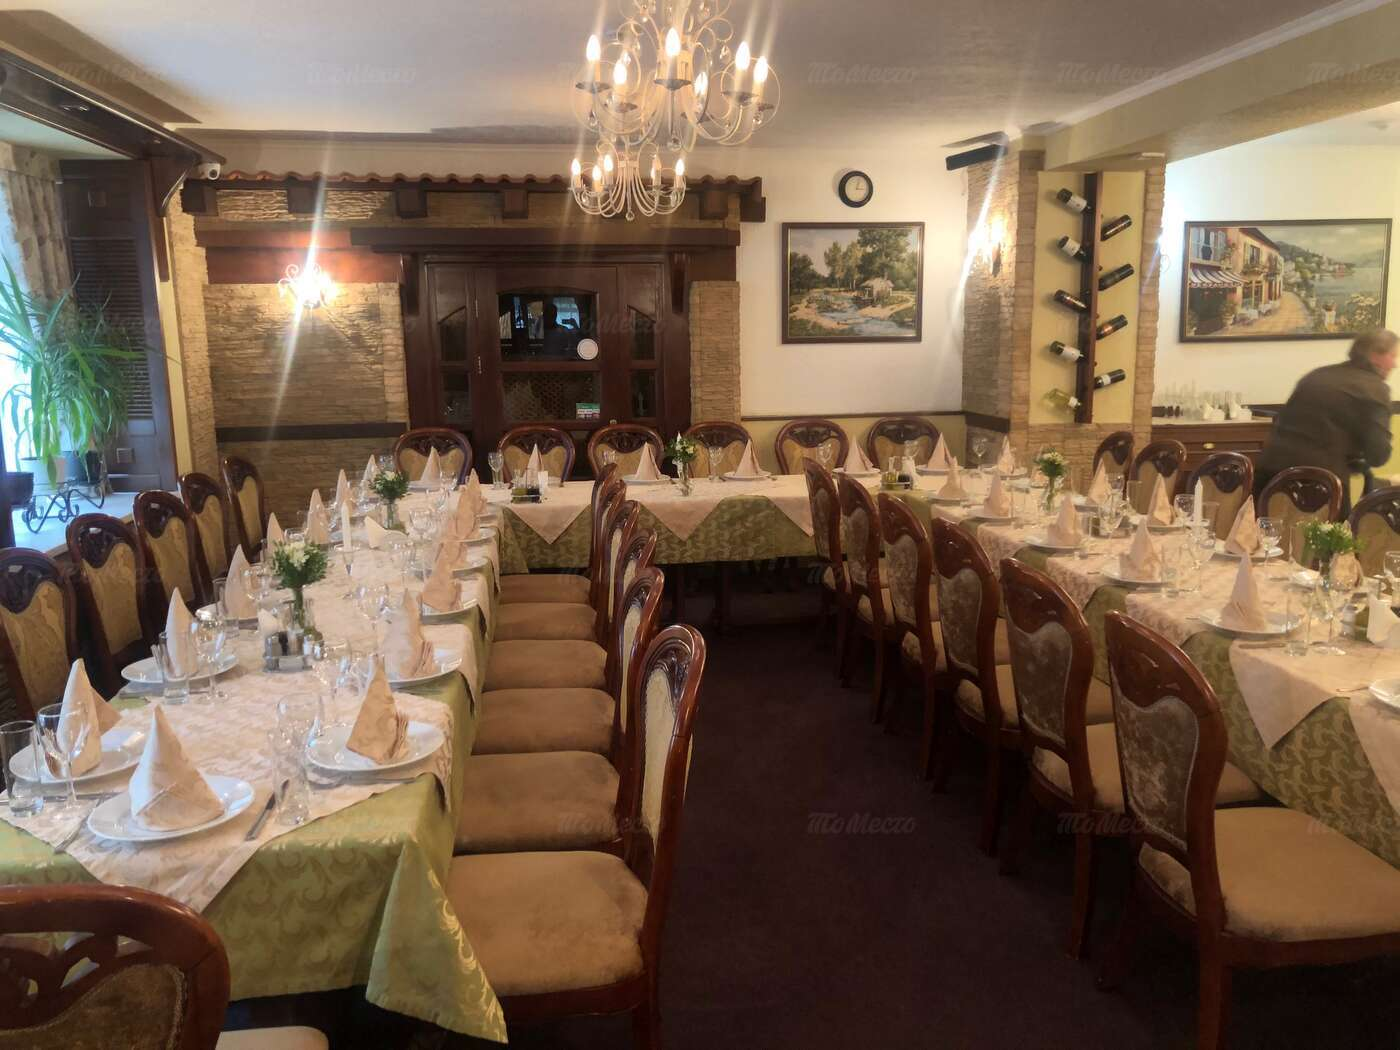 Ресторан Балканский Гурман на Декабристов фото 10